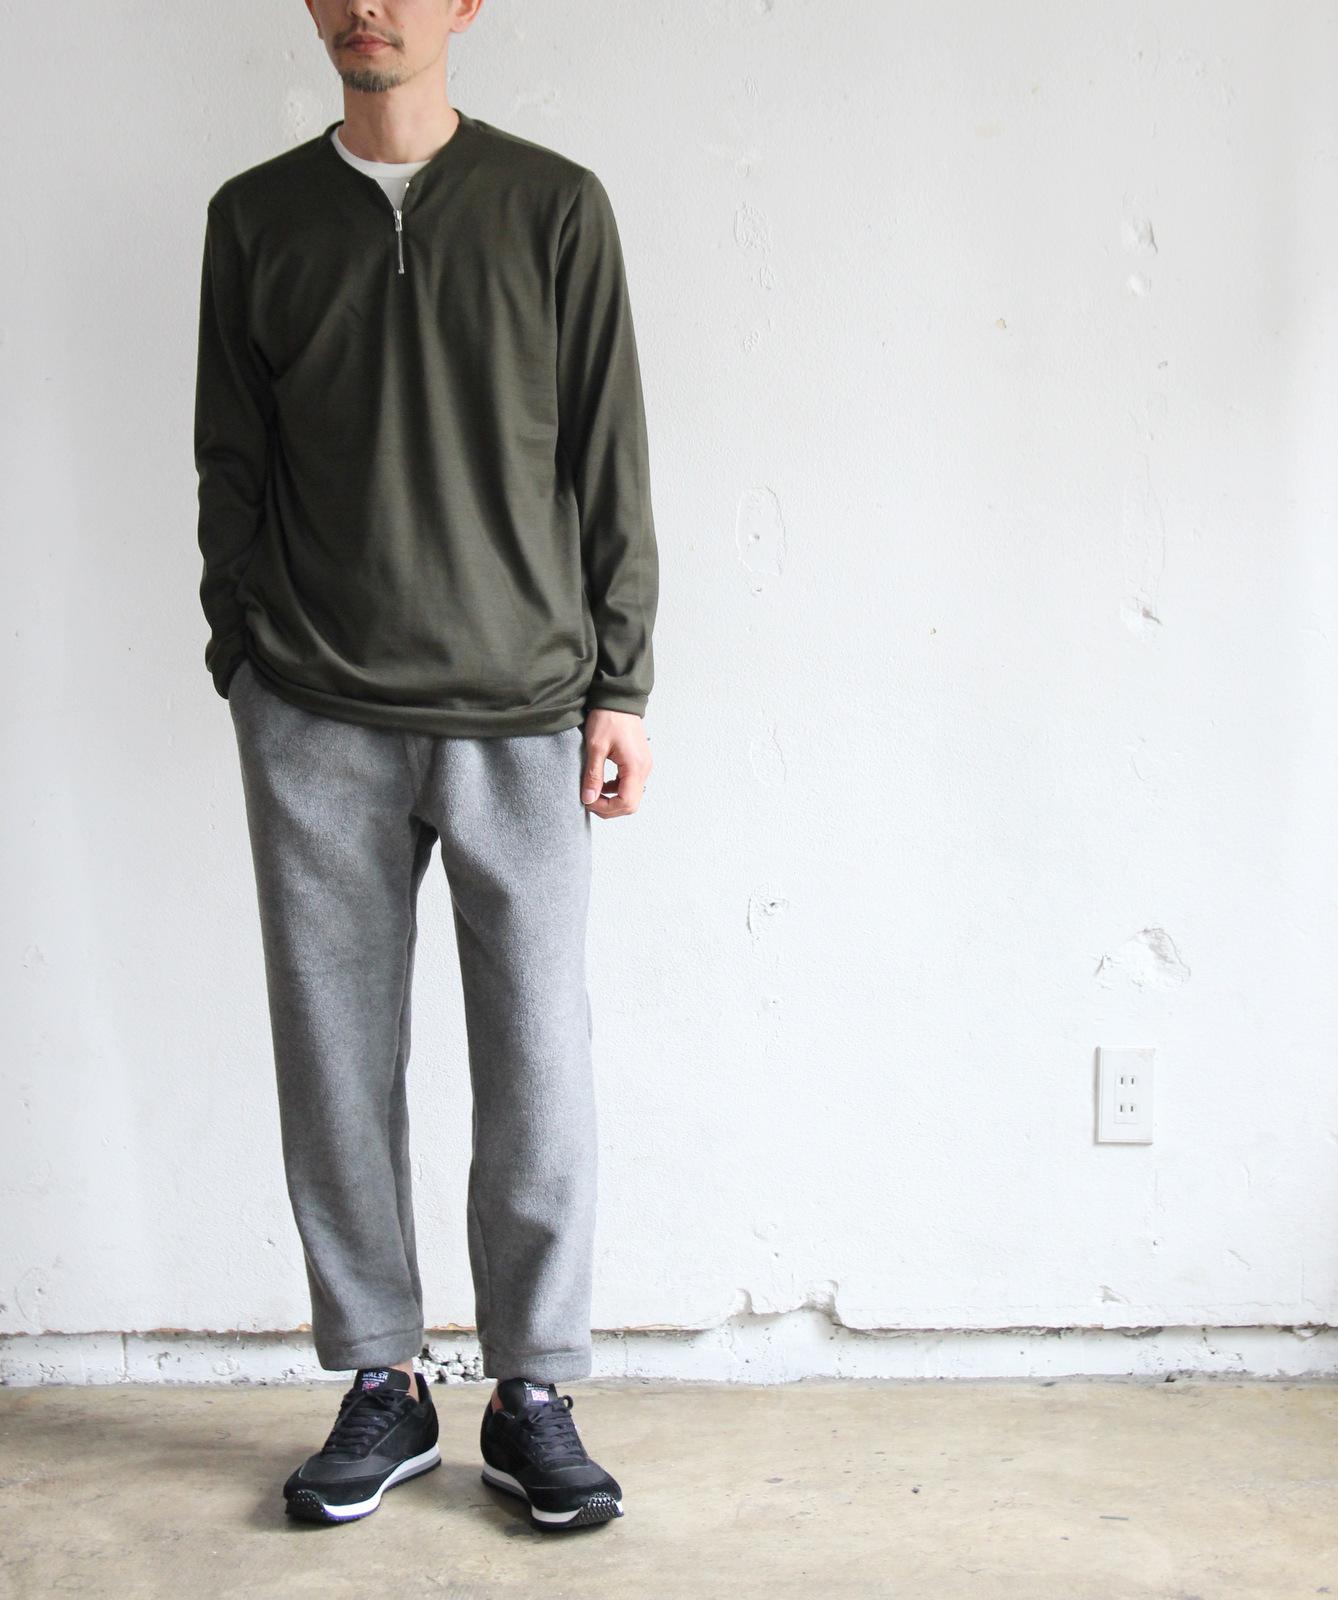 Merino Wool Knit Short Zip Pull Over_c0379477_18504850.jpg